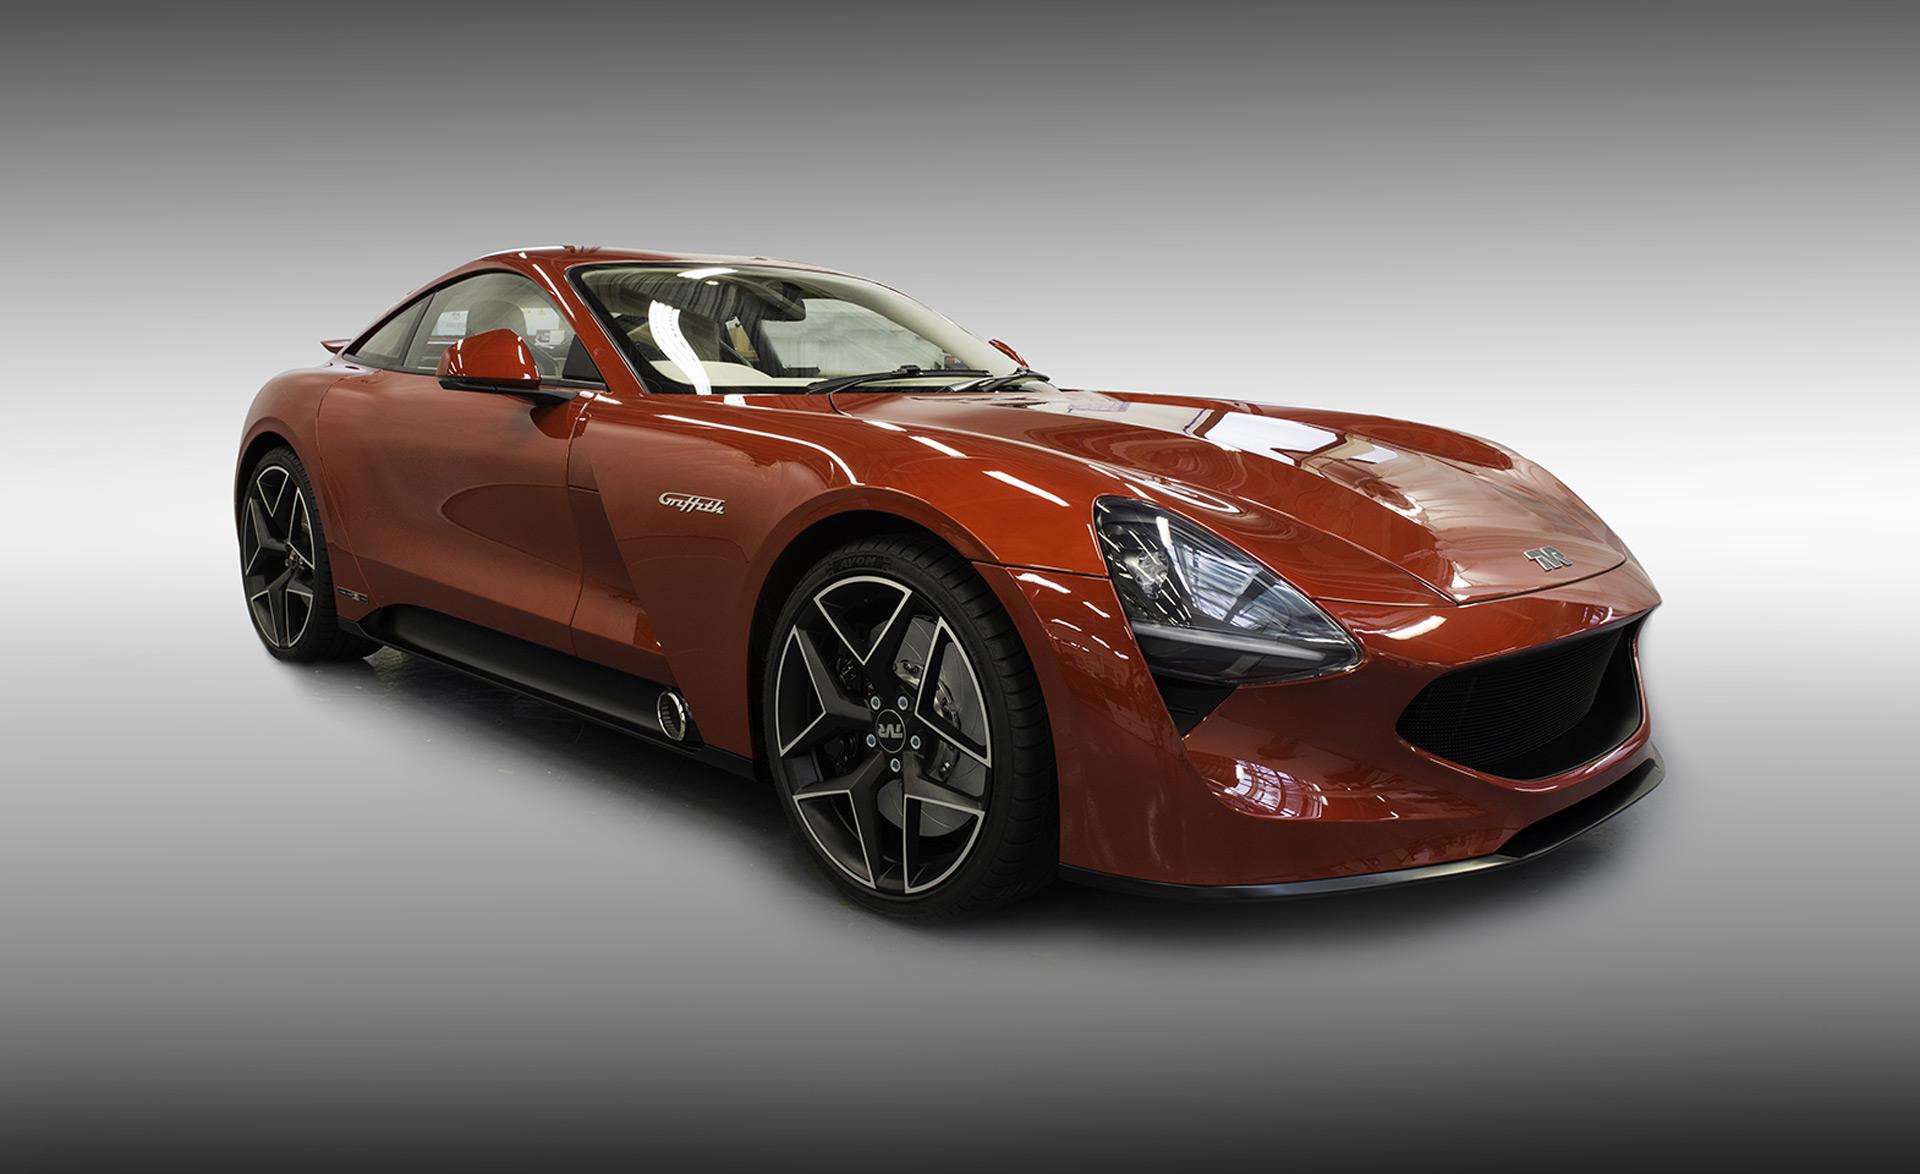 tvr returns with 500 horsepower griffith sports car. Black Bedroom Furniture Sets. Home Design Ideas